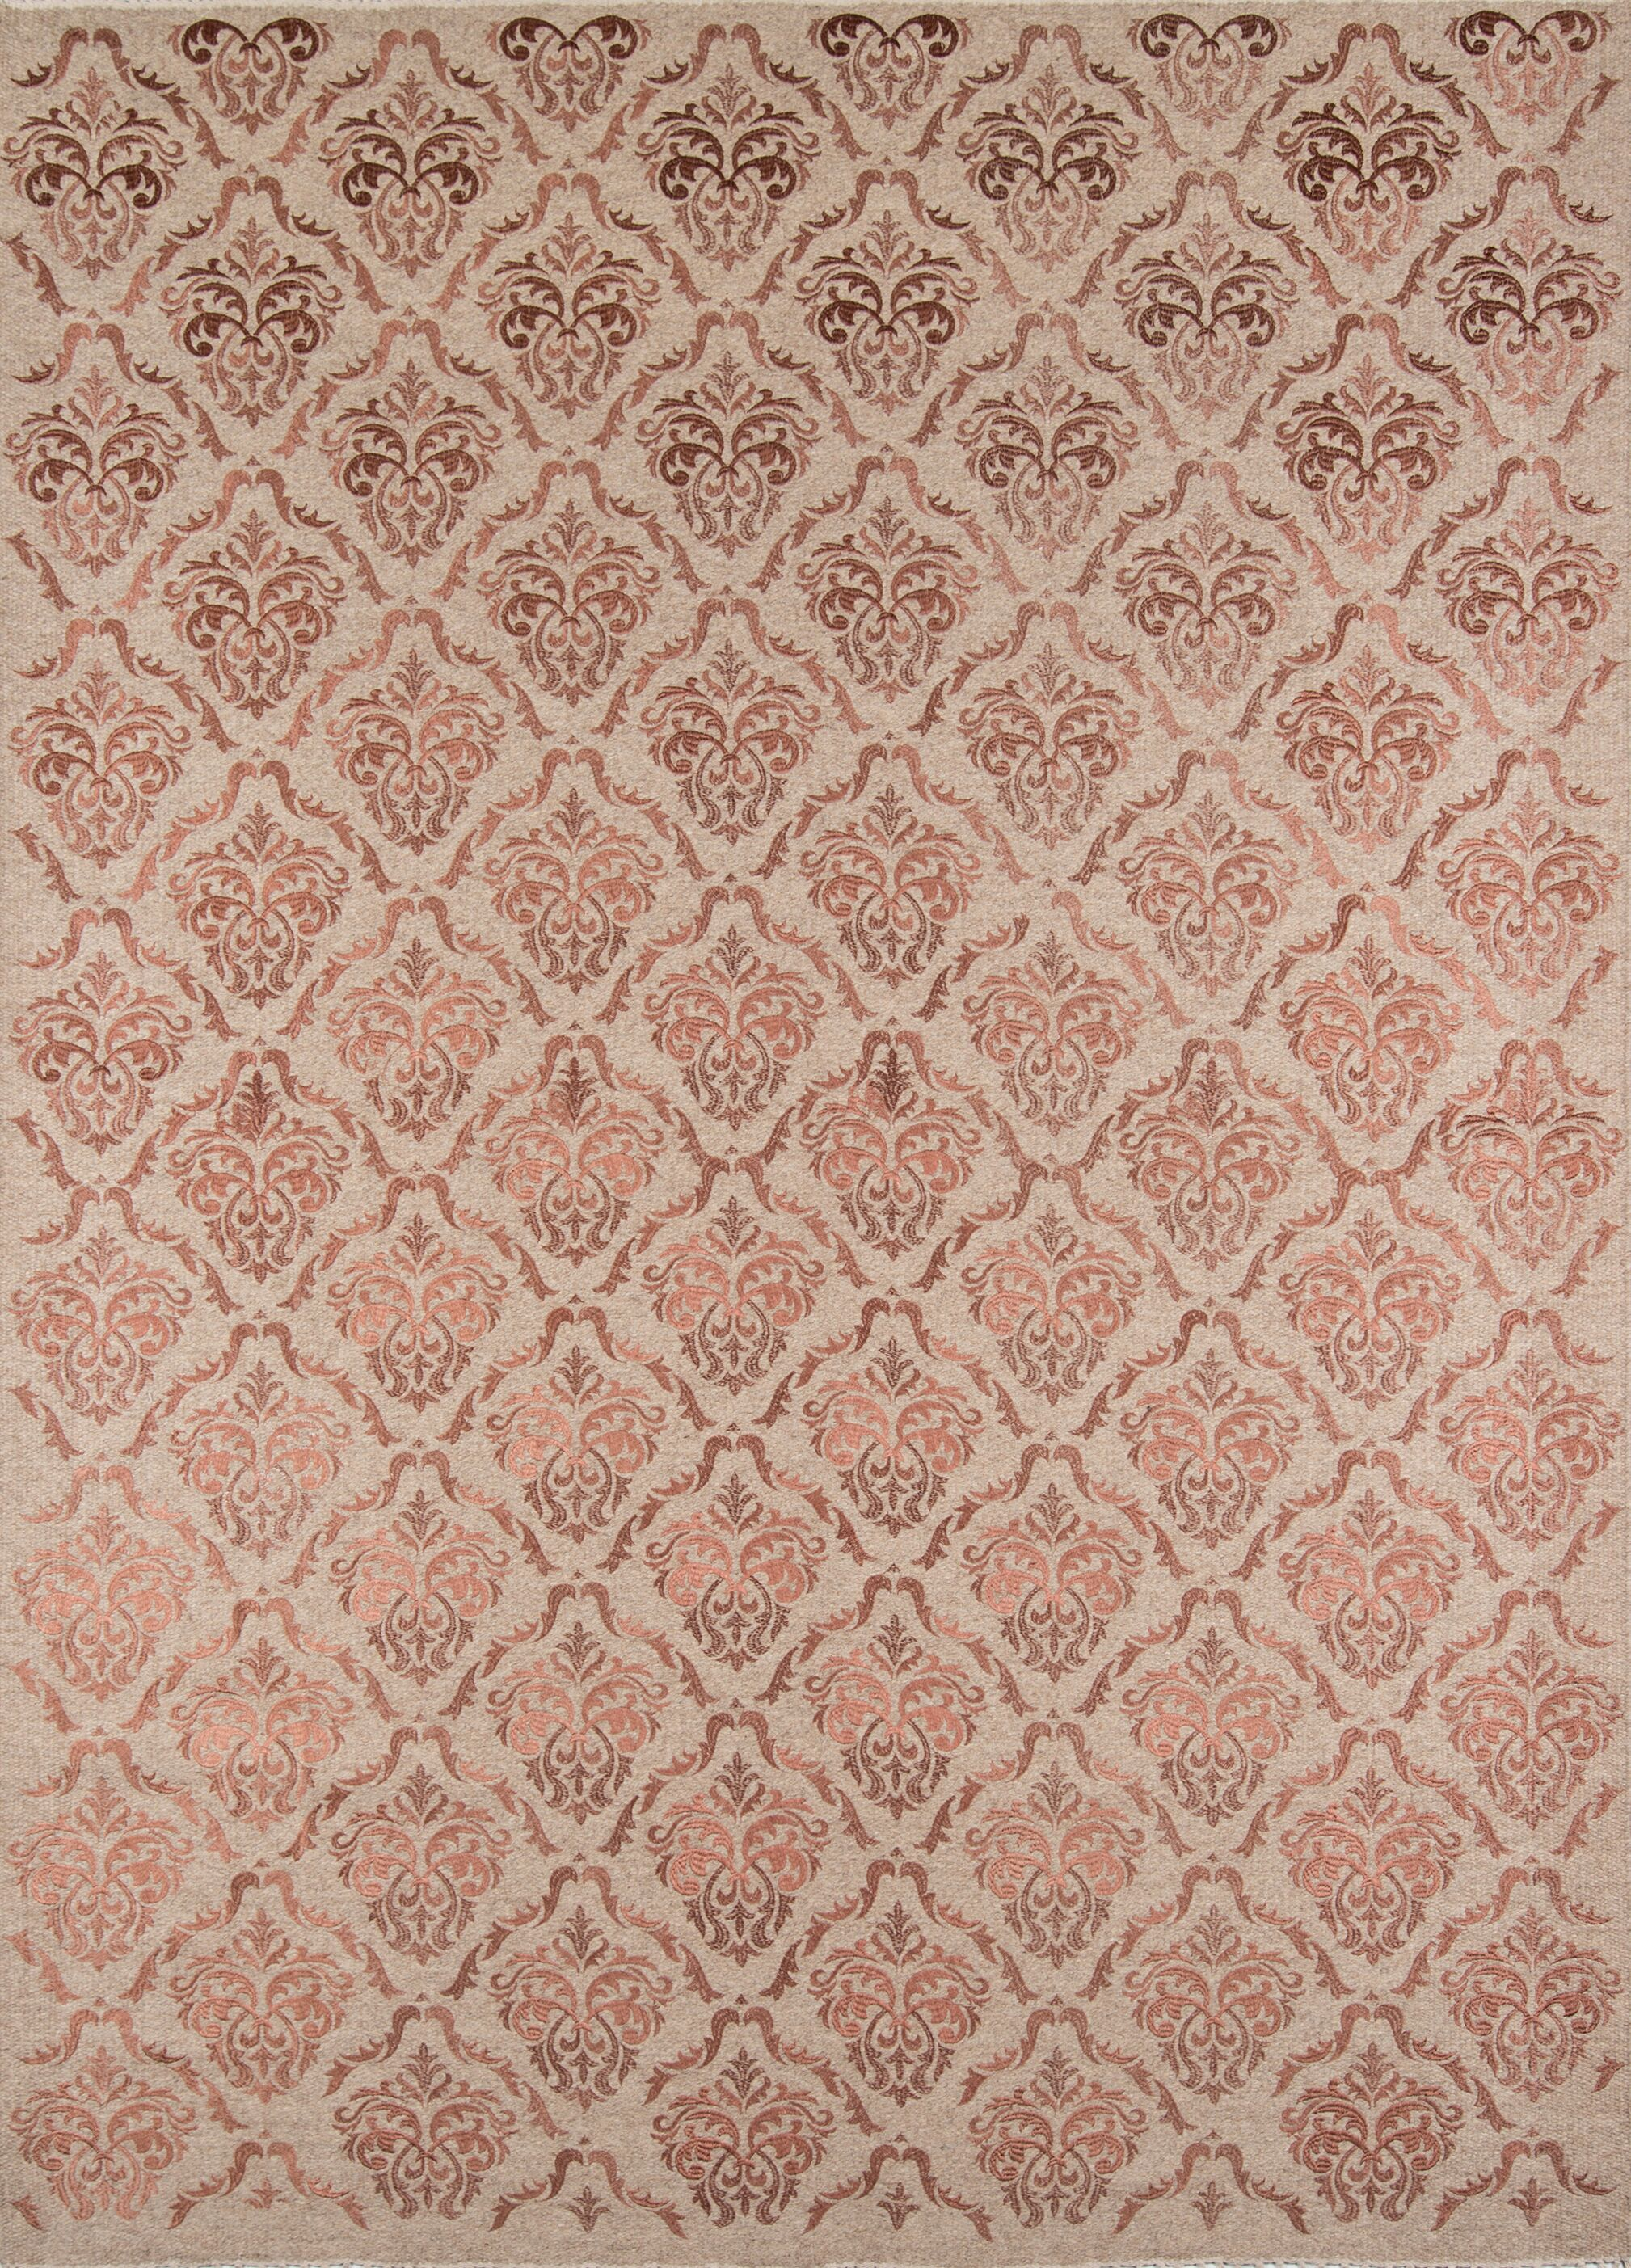 Caspian Hand-Woven Rose Area Rug Rug Size: Rectangle 5' x 8'